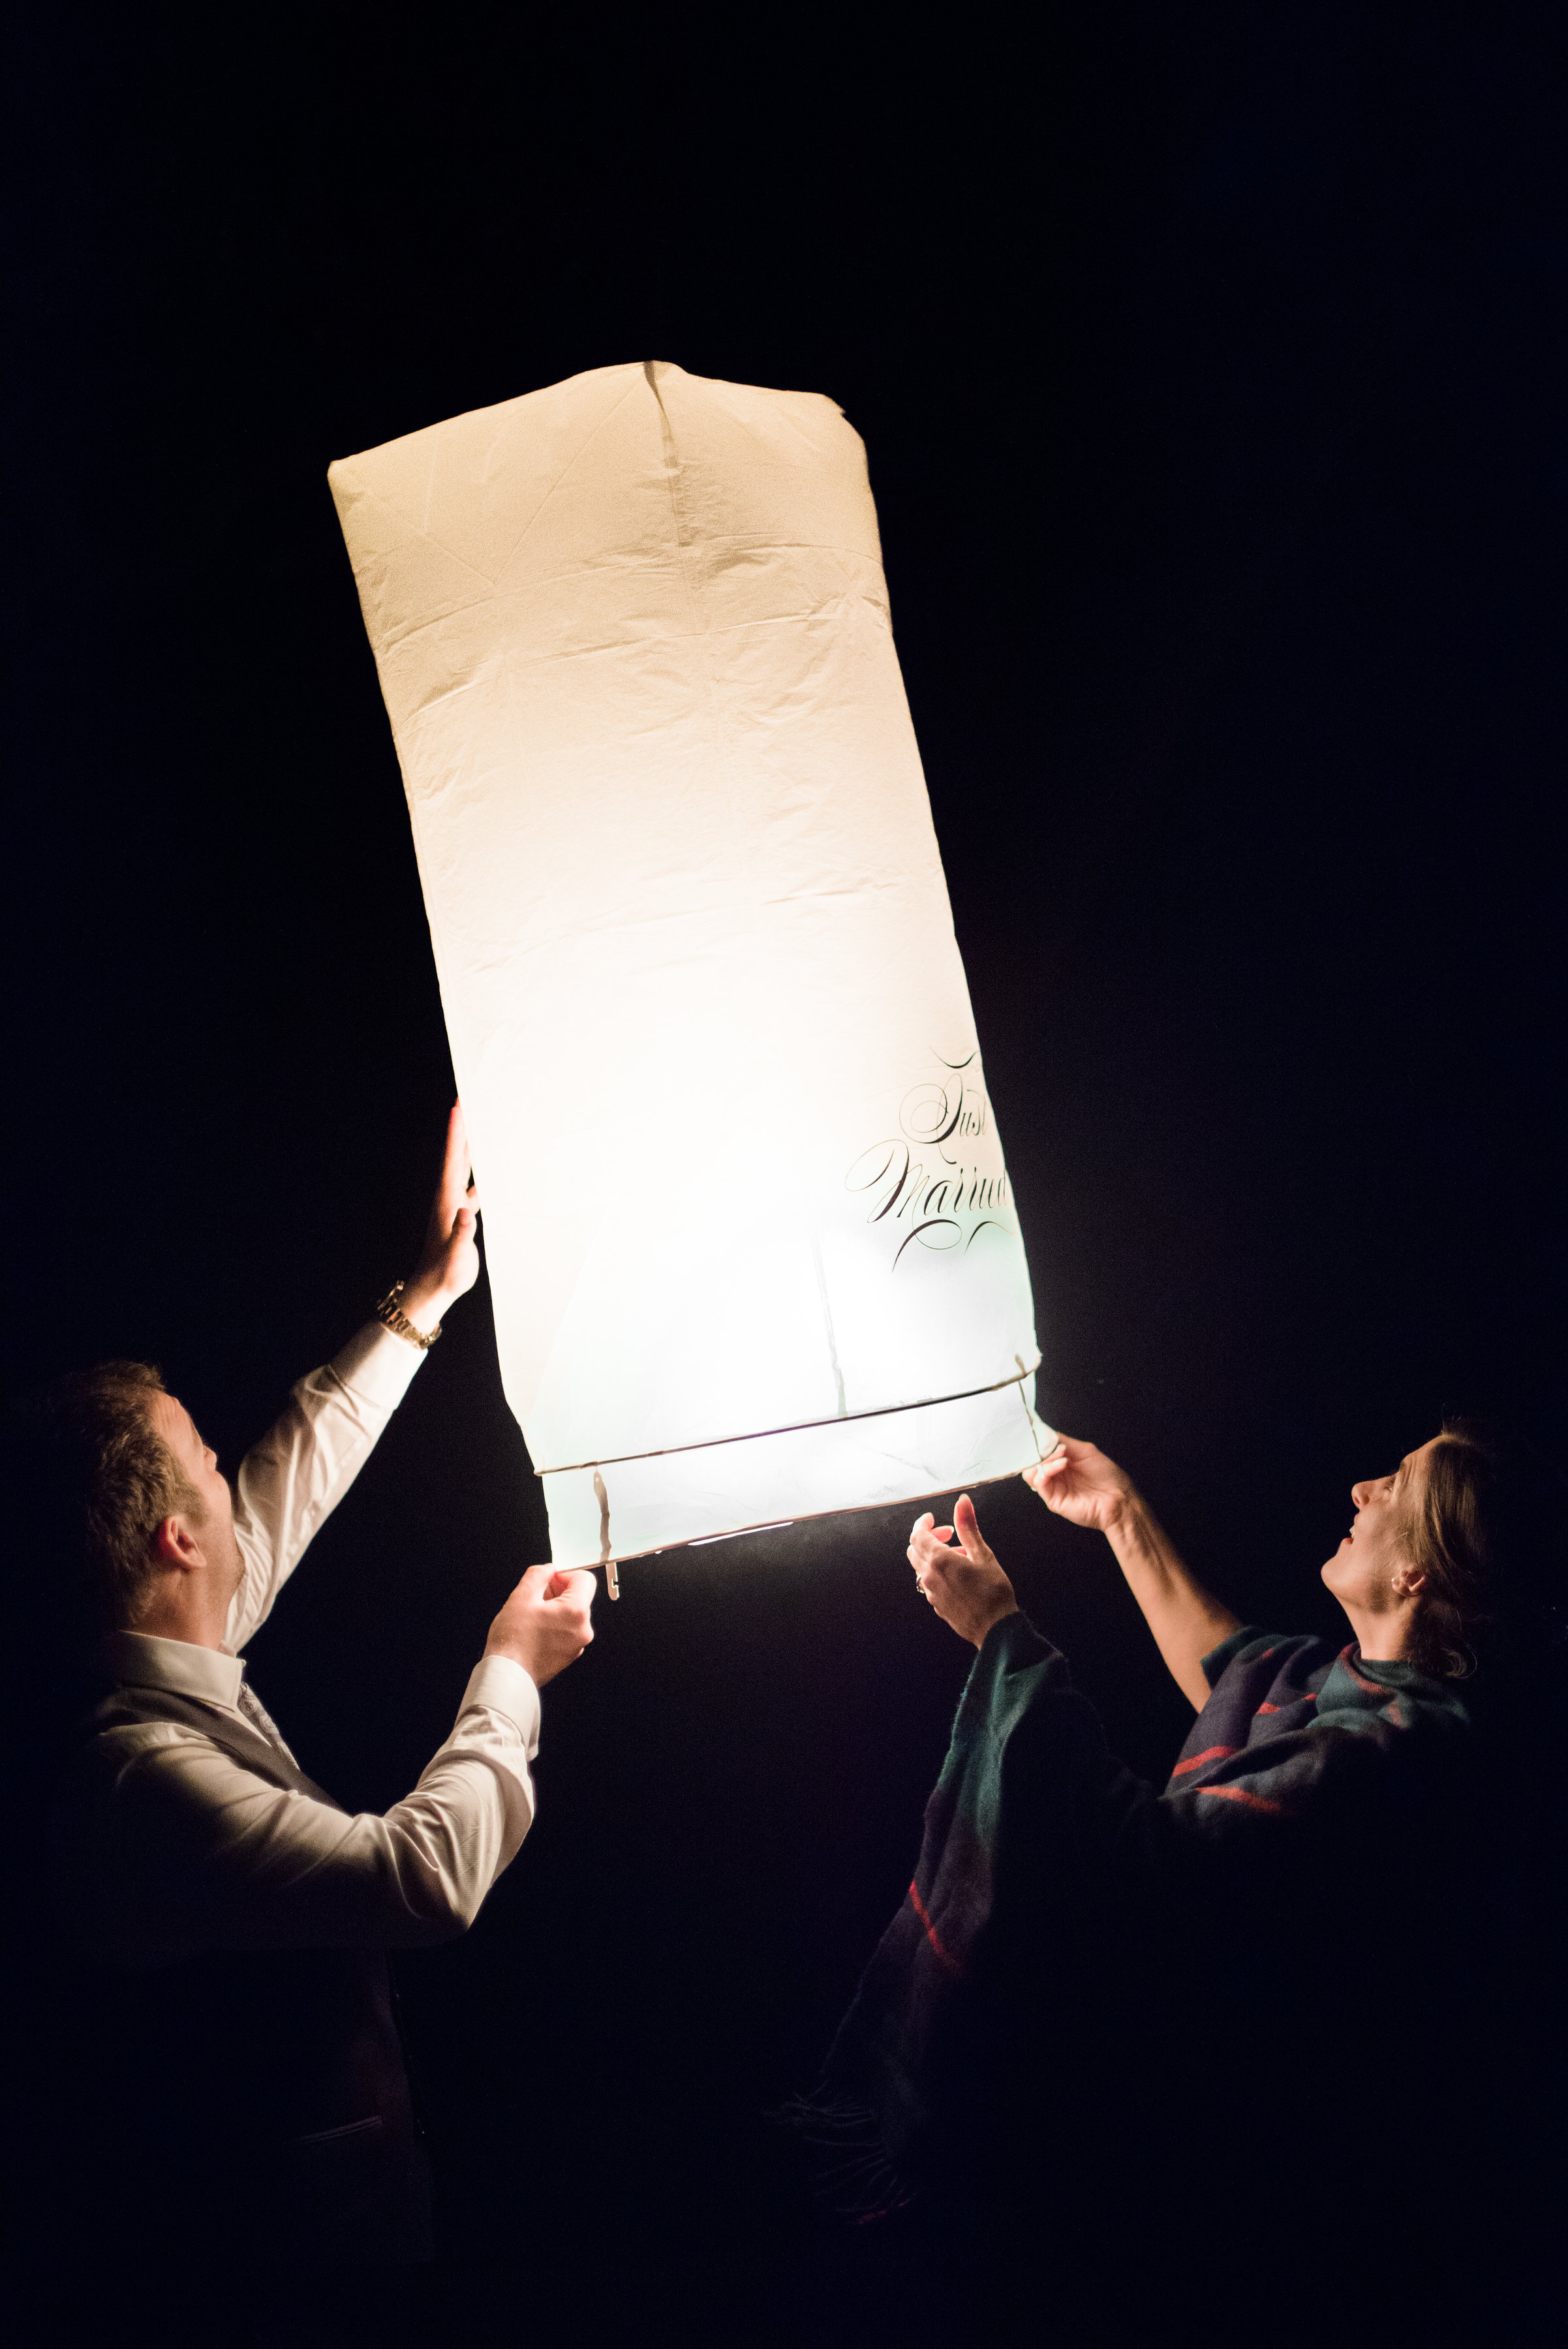 Sky lantern photographed at a destination wedding in Scotland